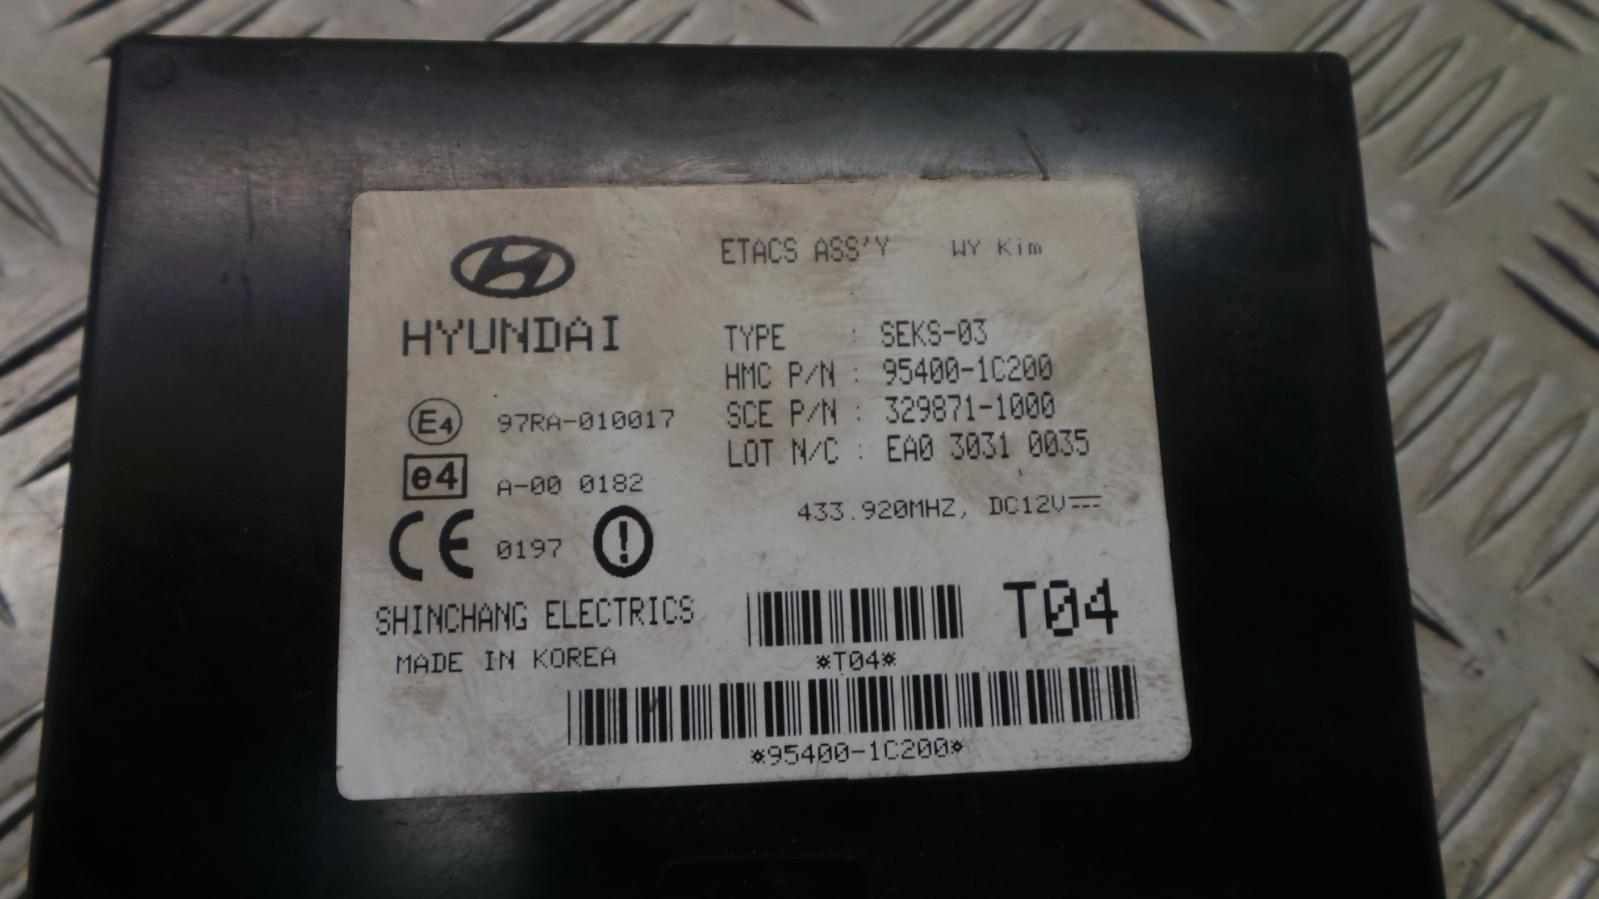 2003 Hyundai Getz 13 Petrol Manual Ignition Kit Engine Ecu Fuse Box 8 Of 12